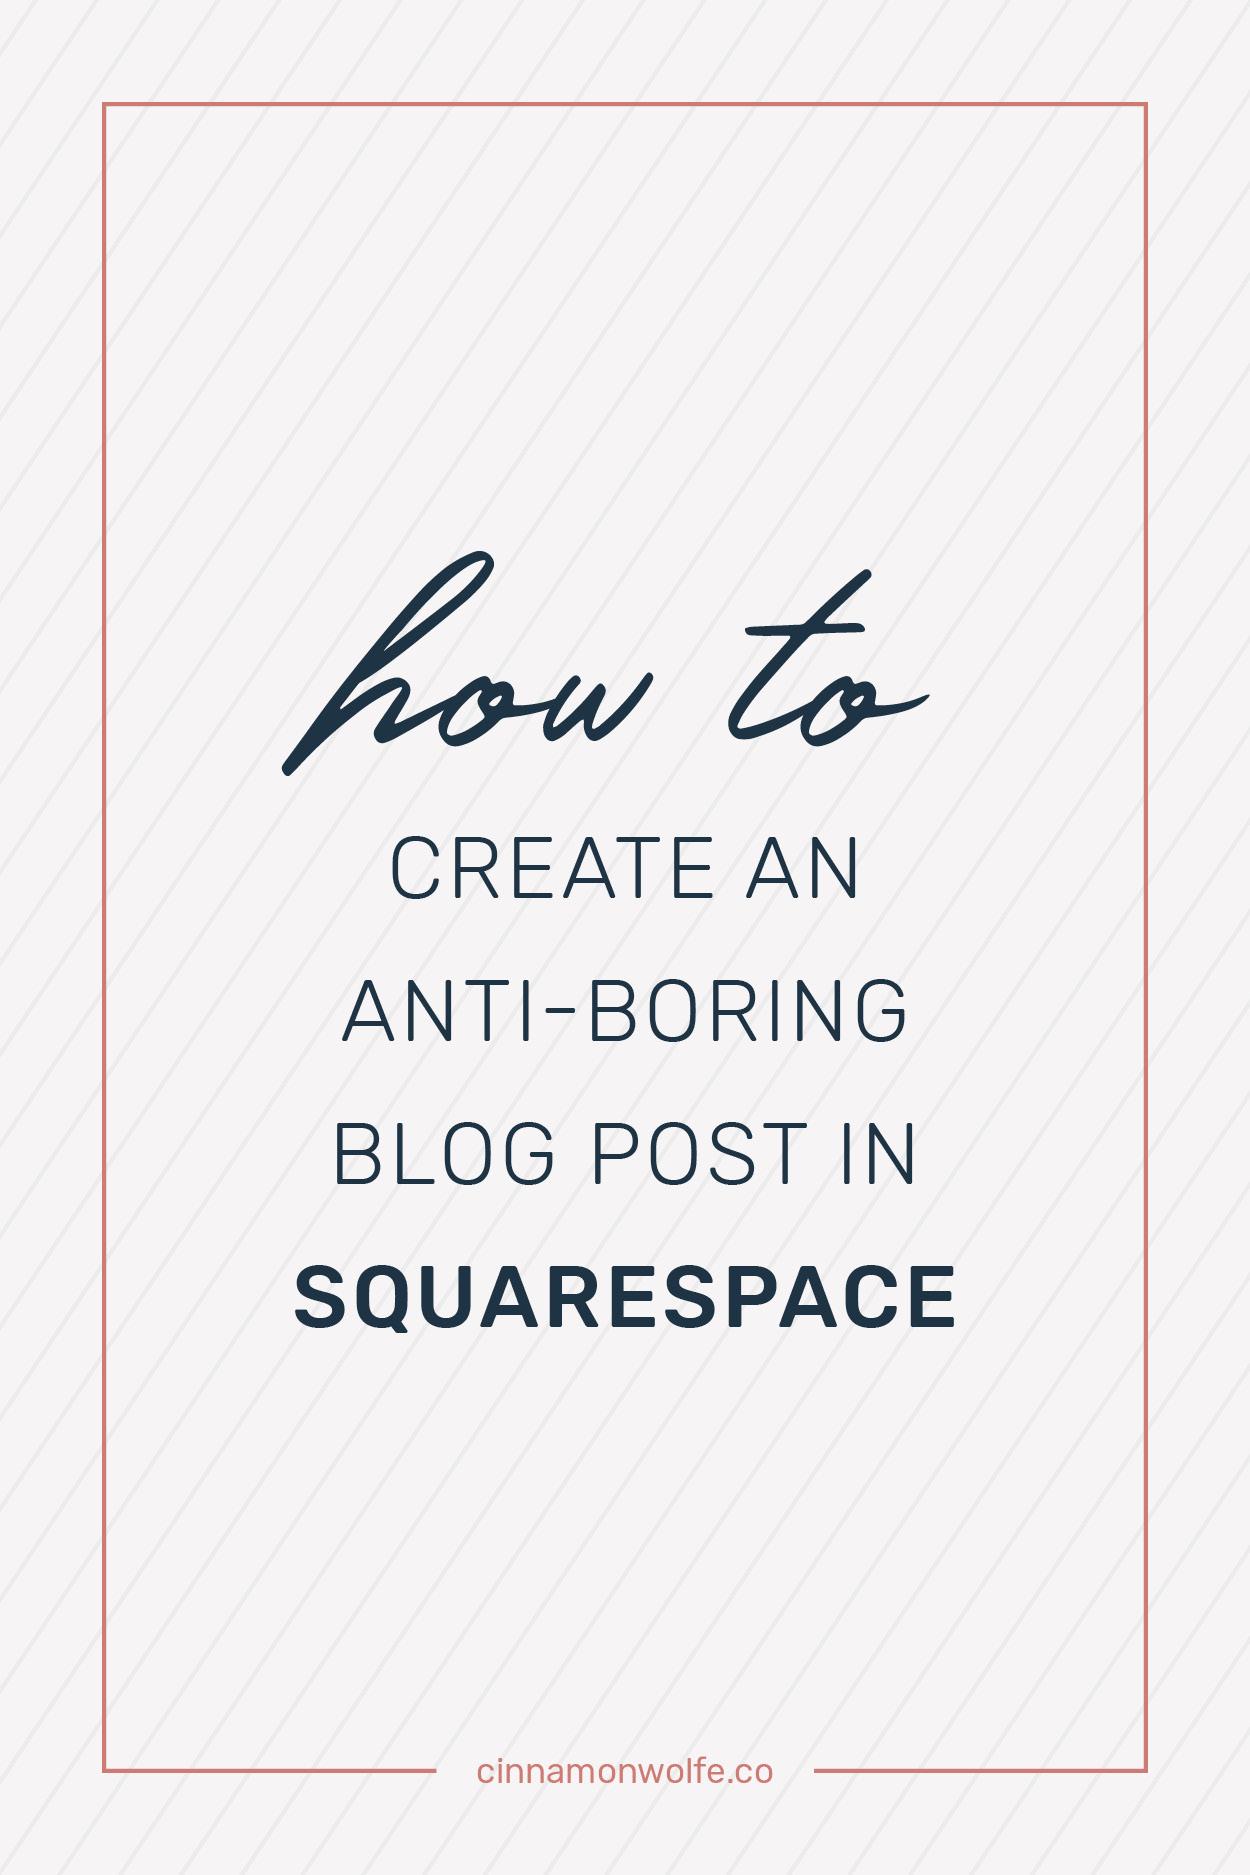 creating an interesting blog post in squaresapce